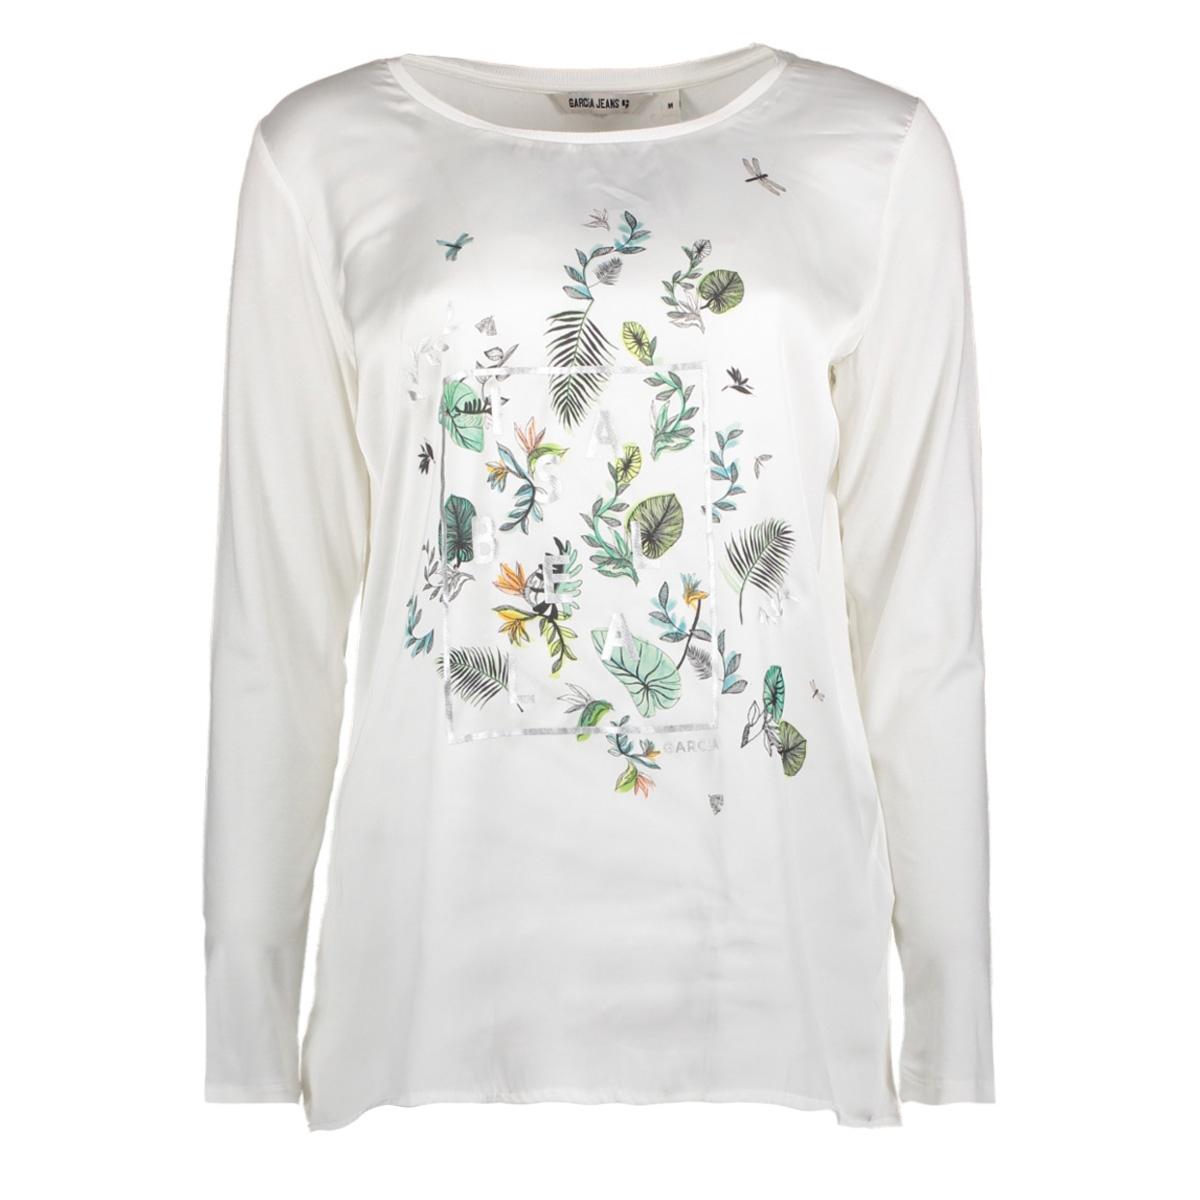 x80011 garcia t-shirt 53 off white